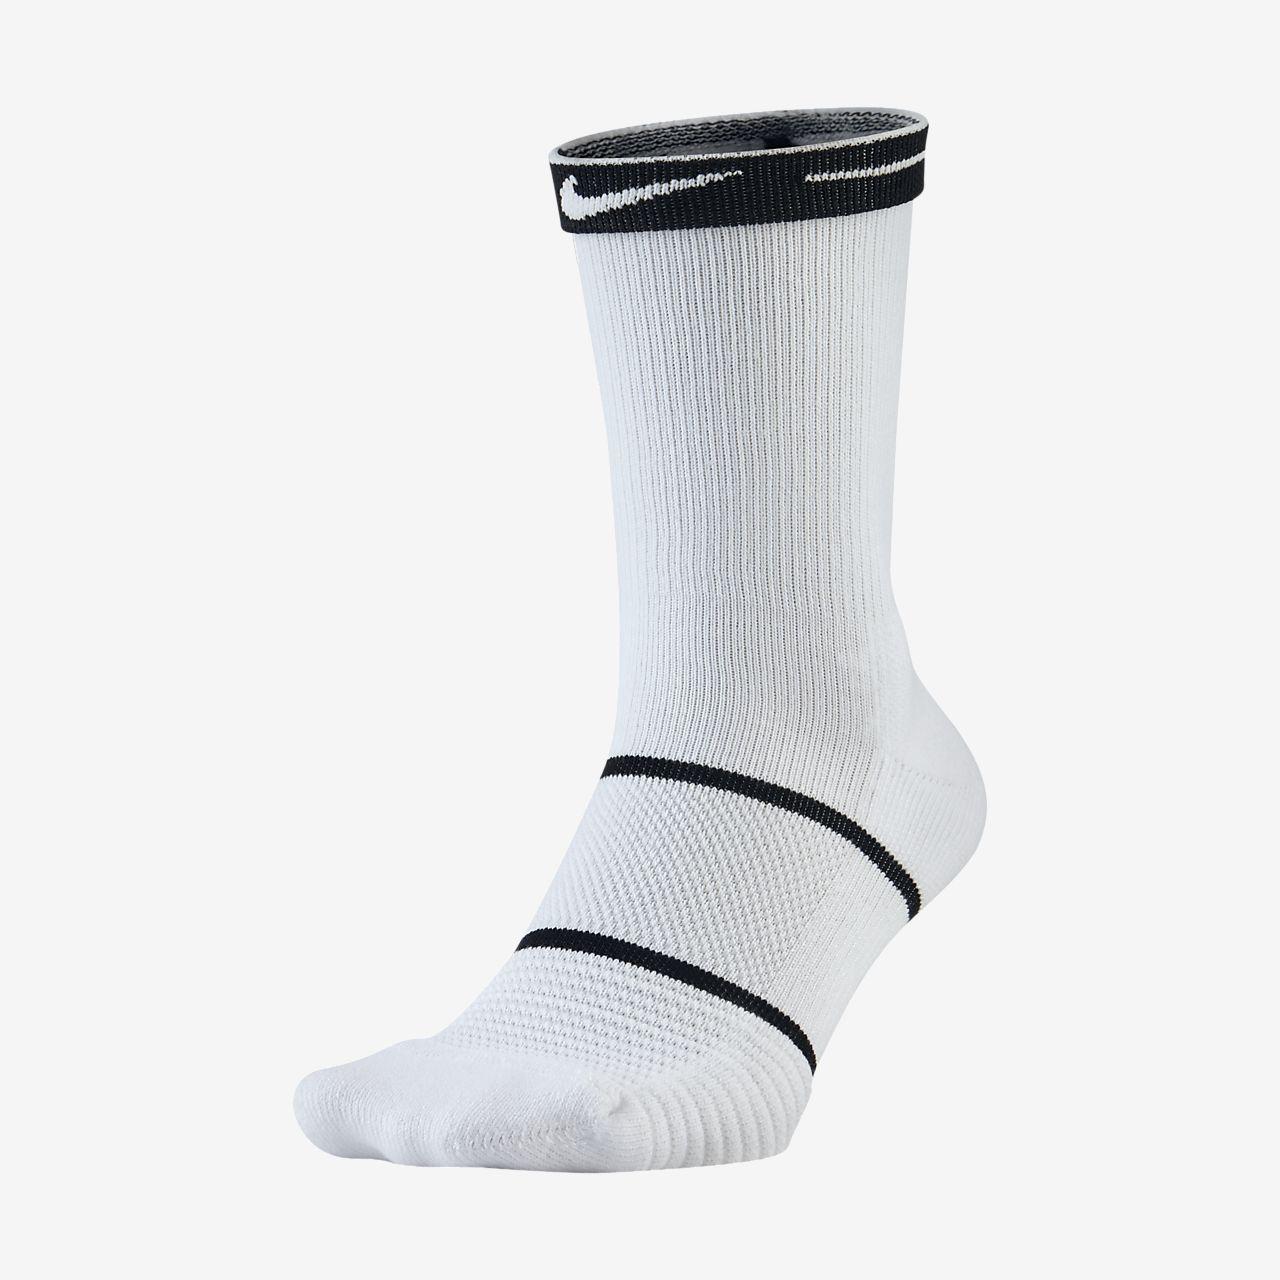 NikeCourt Essentials Crew Tenis Çorapları